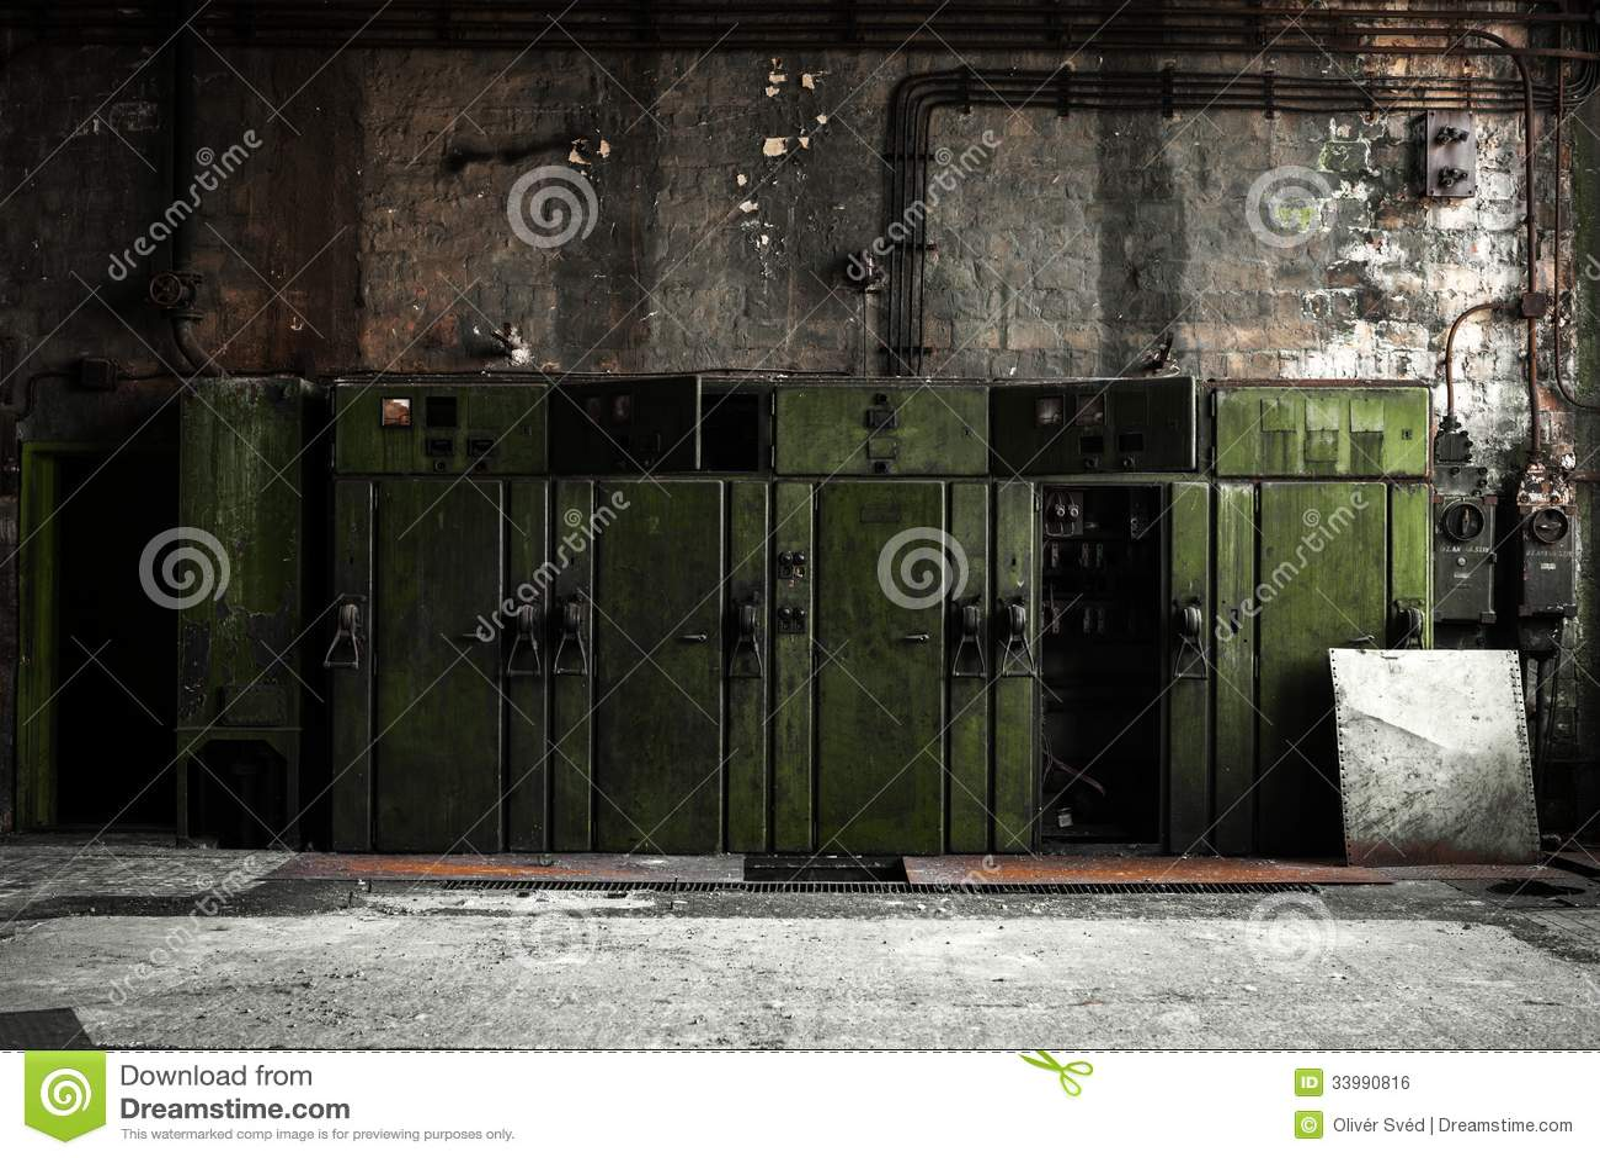 industrial fuse boxes royalty free stock image image. Black Bedroom Furniture Sets. Home Design Ideas